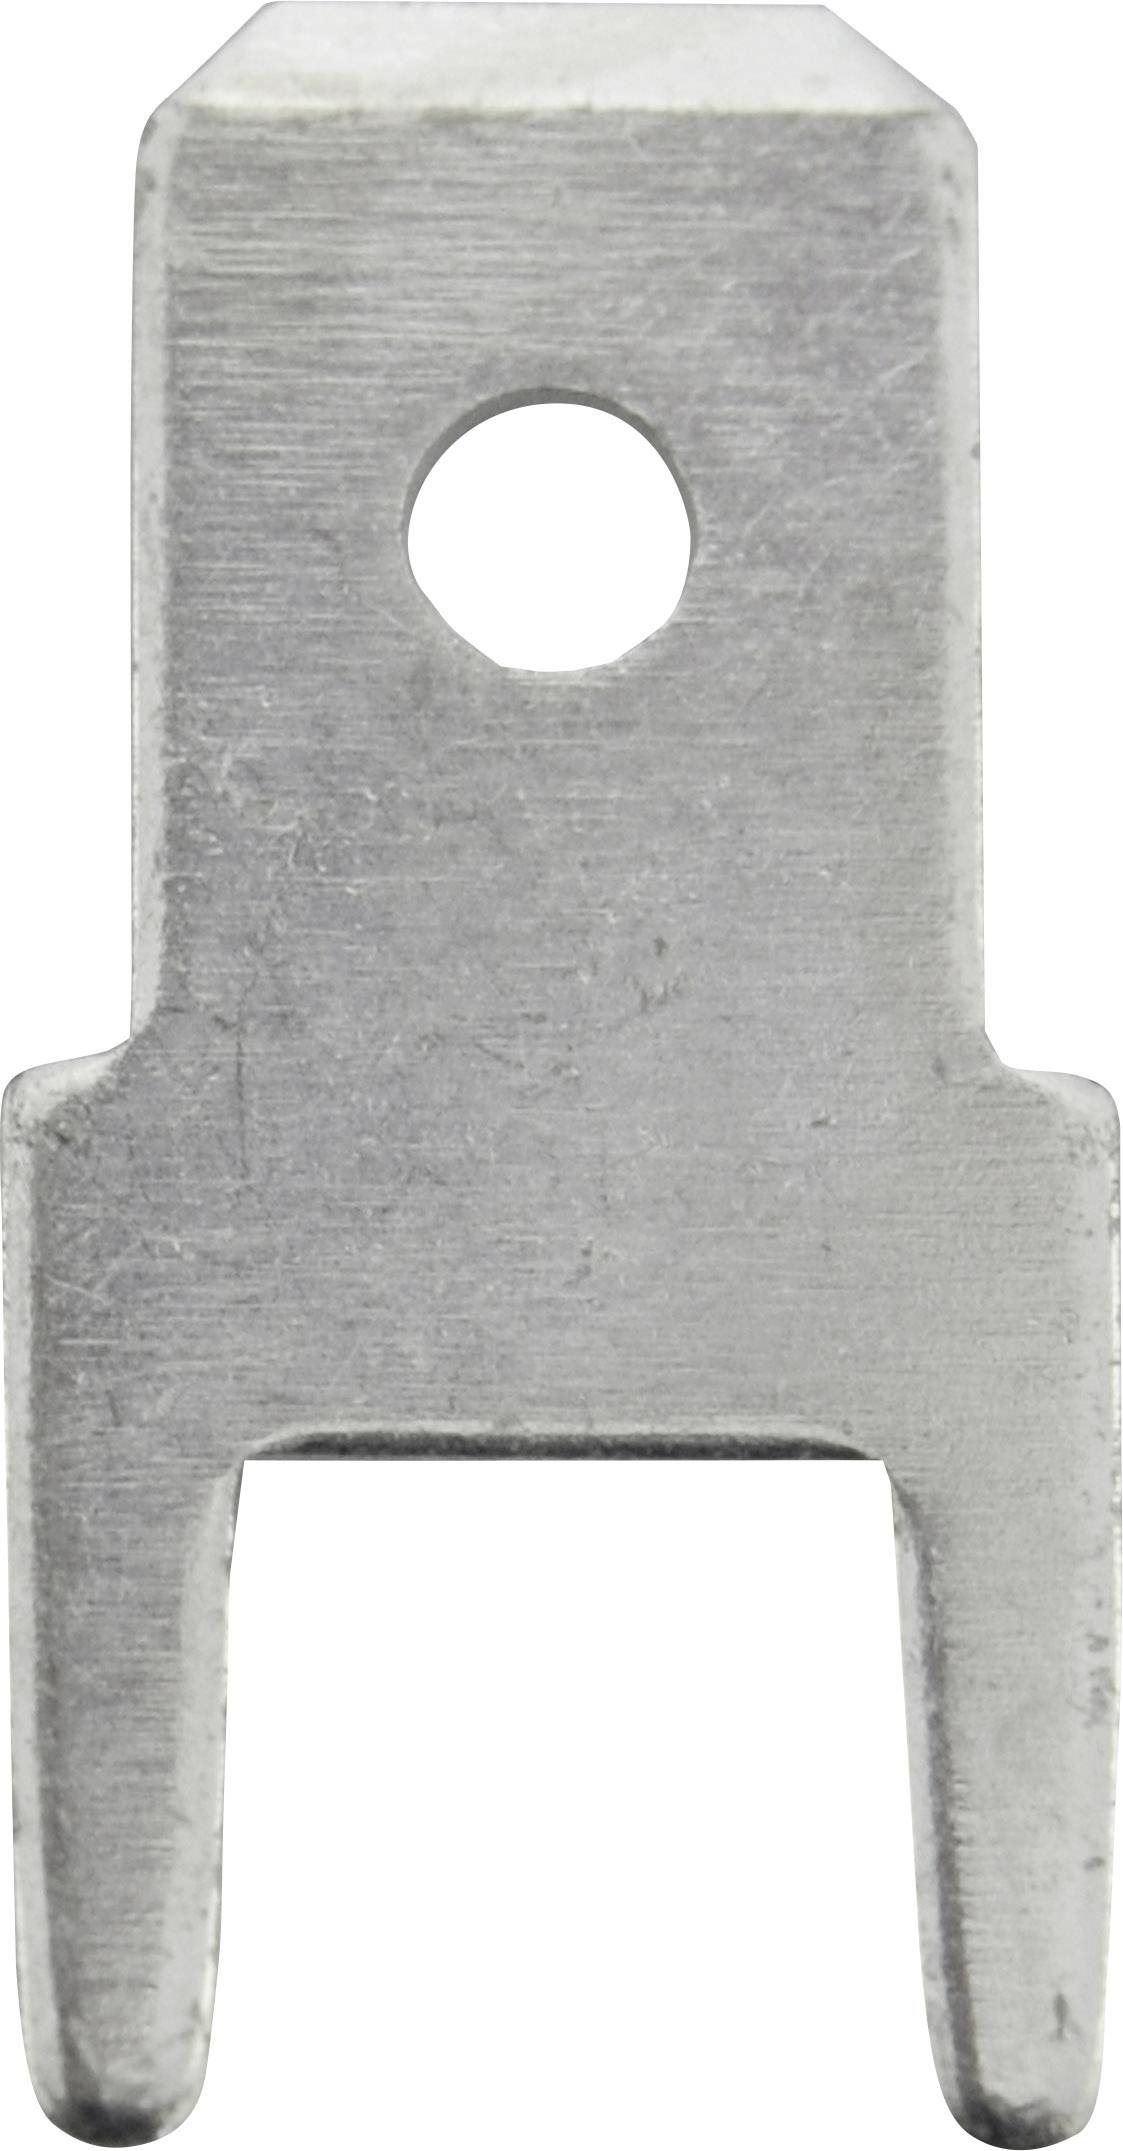 Faston zástrčka Vogt Verbindungstechnik 382508.28 4.8 mm x 0.8 mm, 180 °, bez izolace, kov, 100 ks